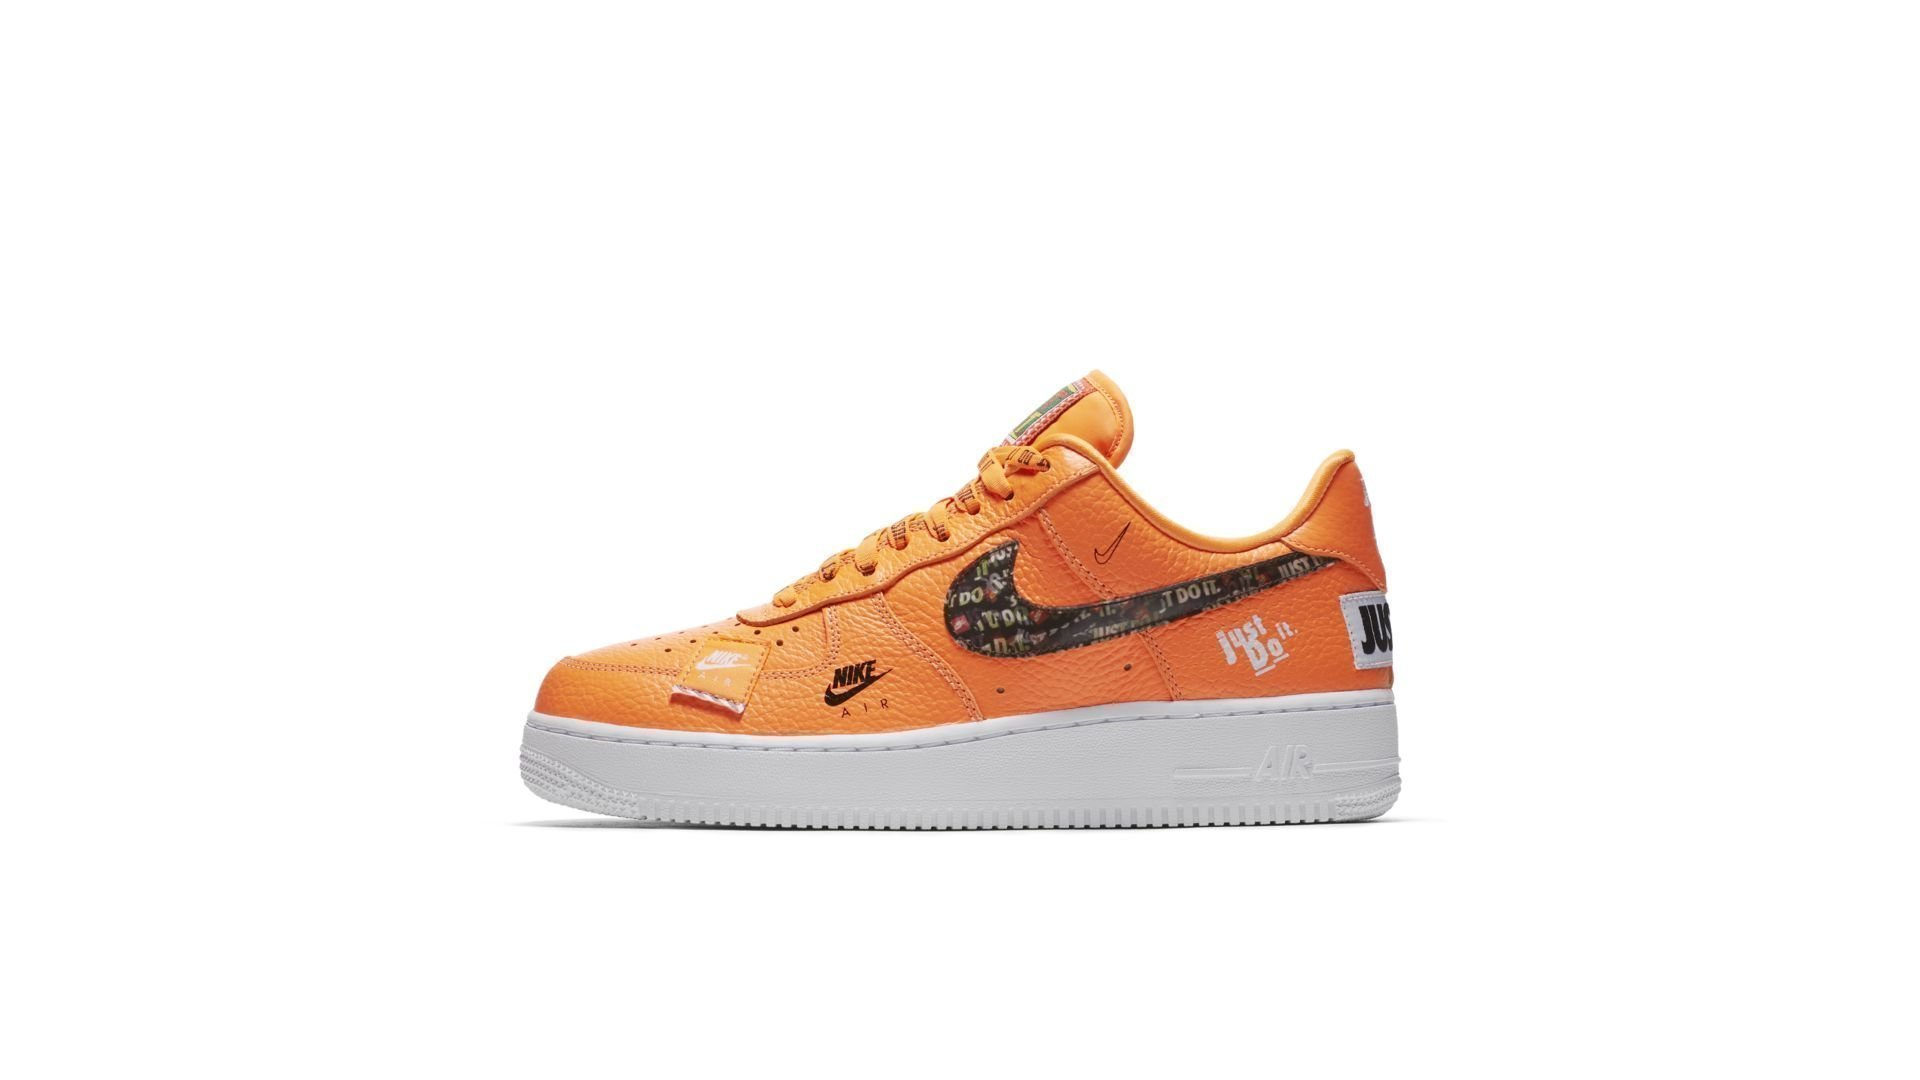 Nike Air Force AR7719-800